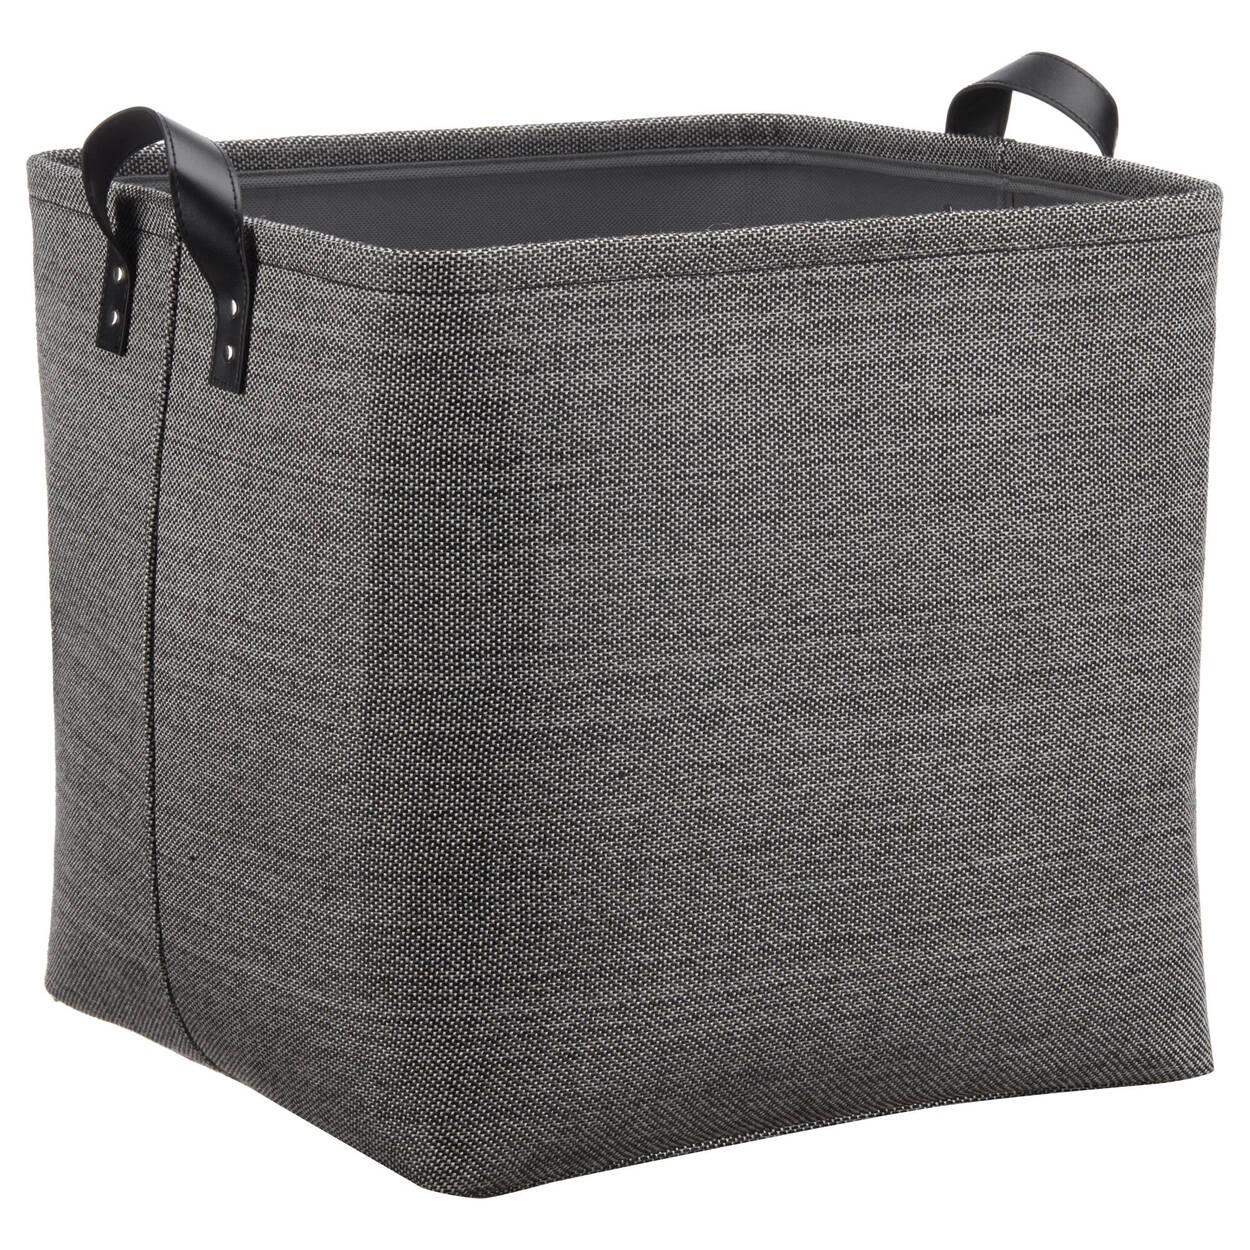 Storage Basket with Handles